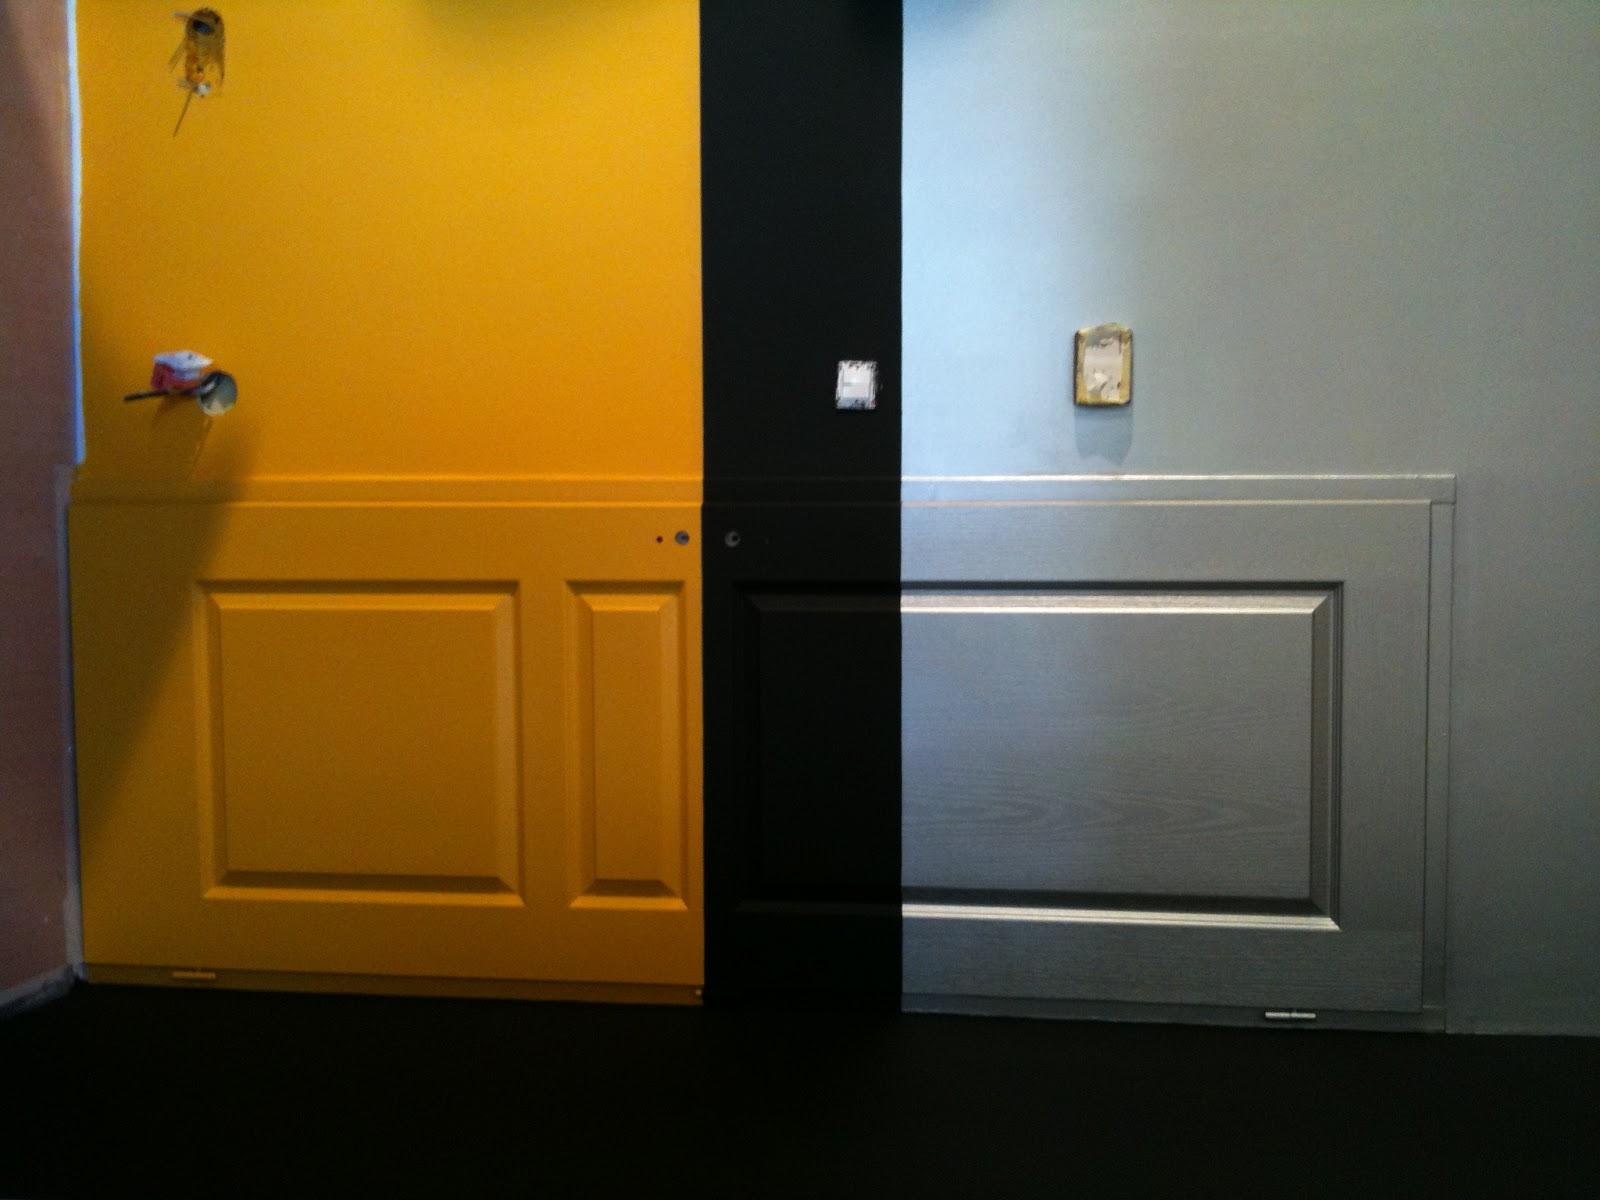 Julien roure peinture chambre new york effet bandes - Chambre a coucher new york ...